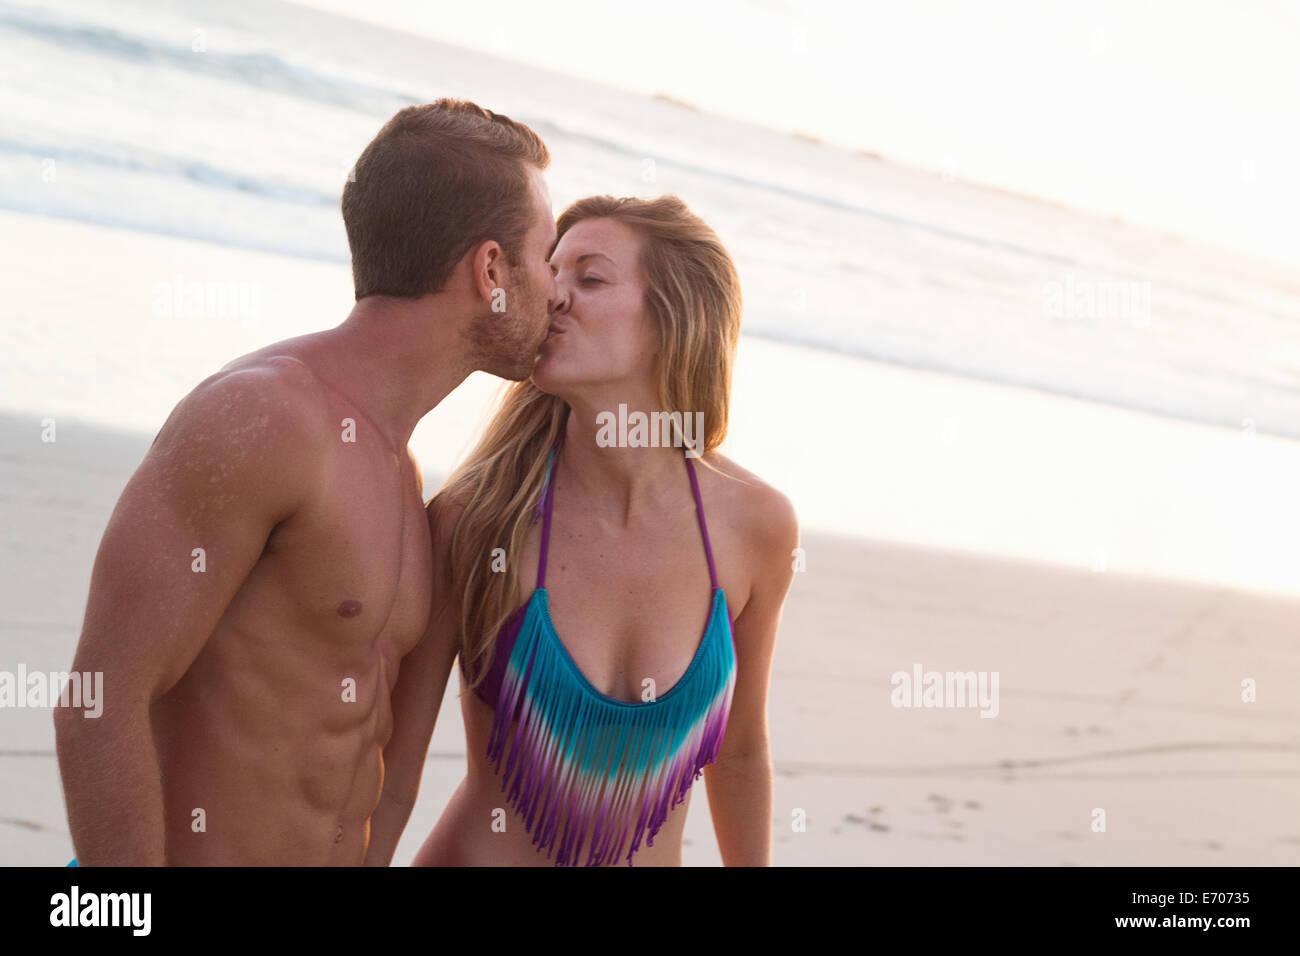 Romantic couple kissing on beach, Nosara, Guanacaste, Costa Rica - Stock Image